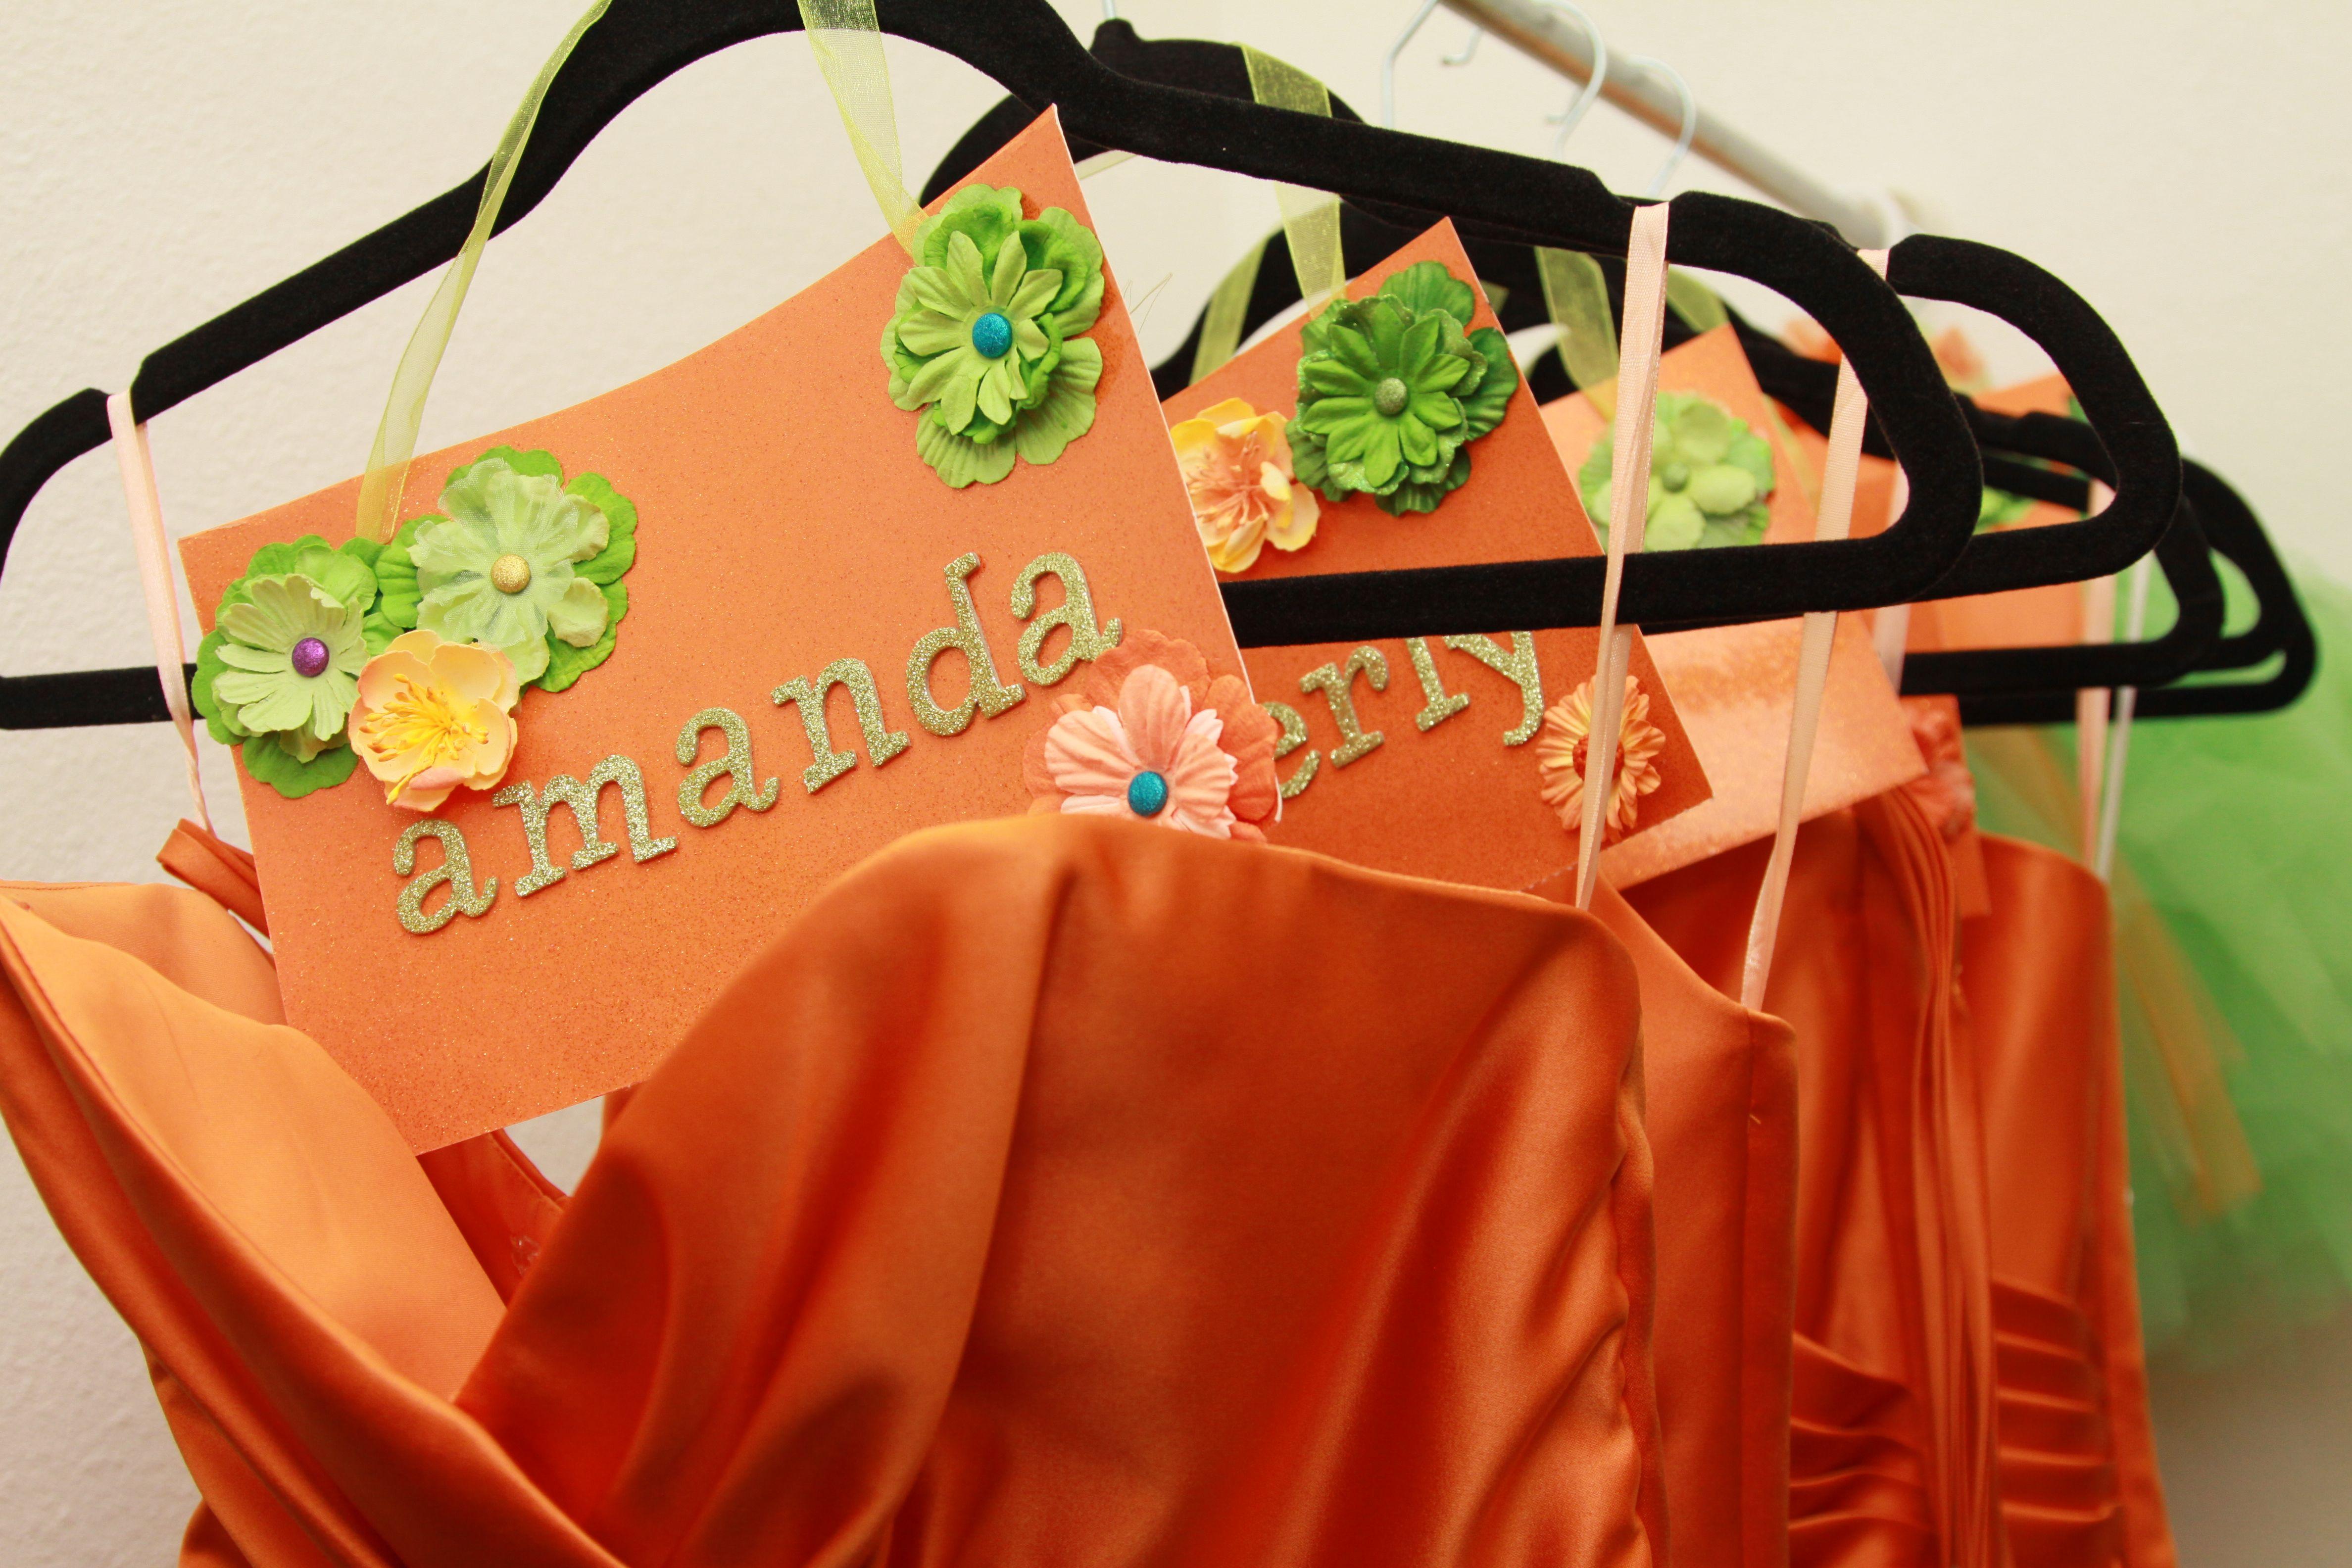 Dresses for wedding maids  wedding brides maids brides maid dresses wedding details details